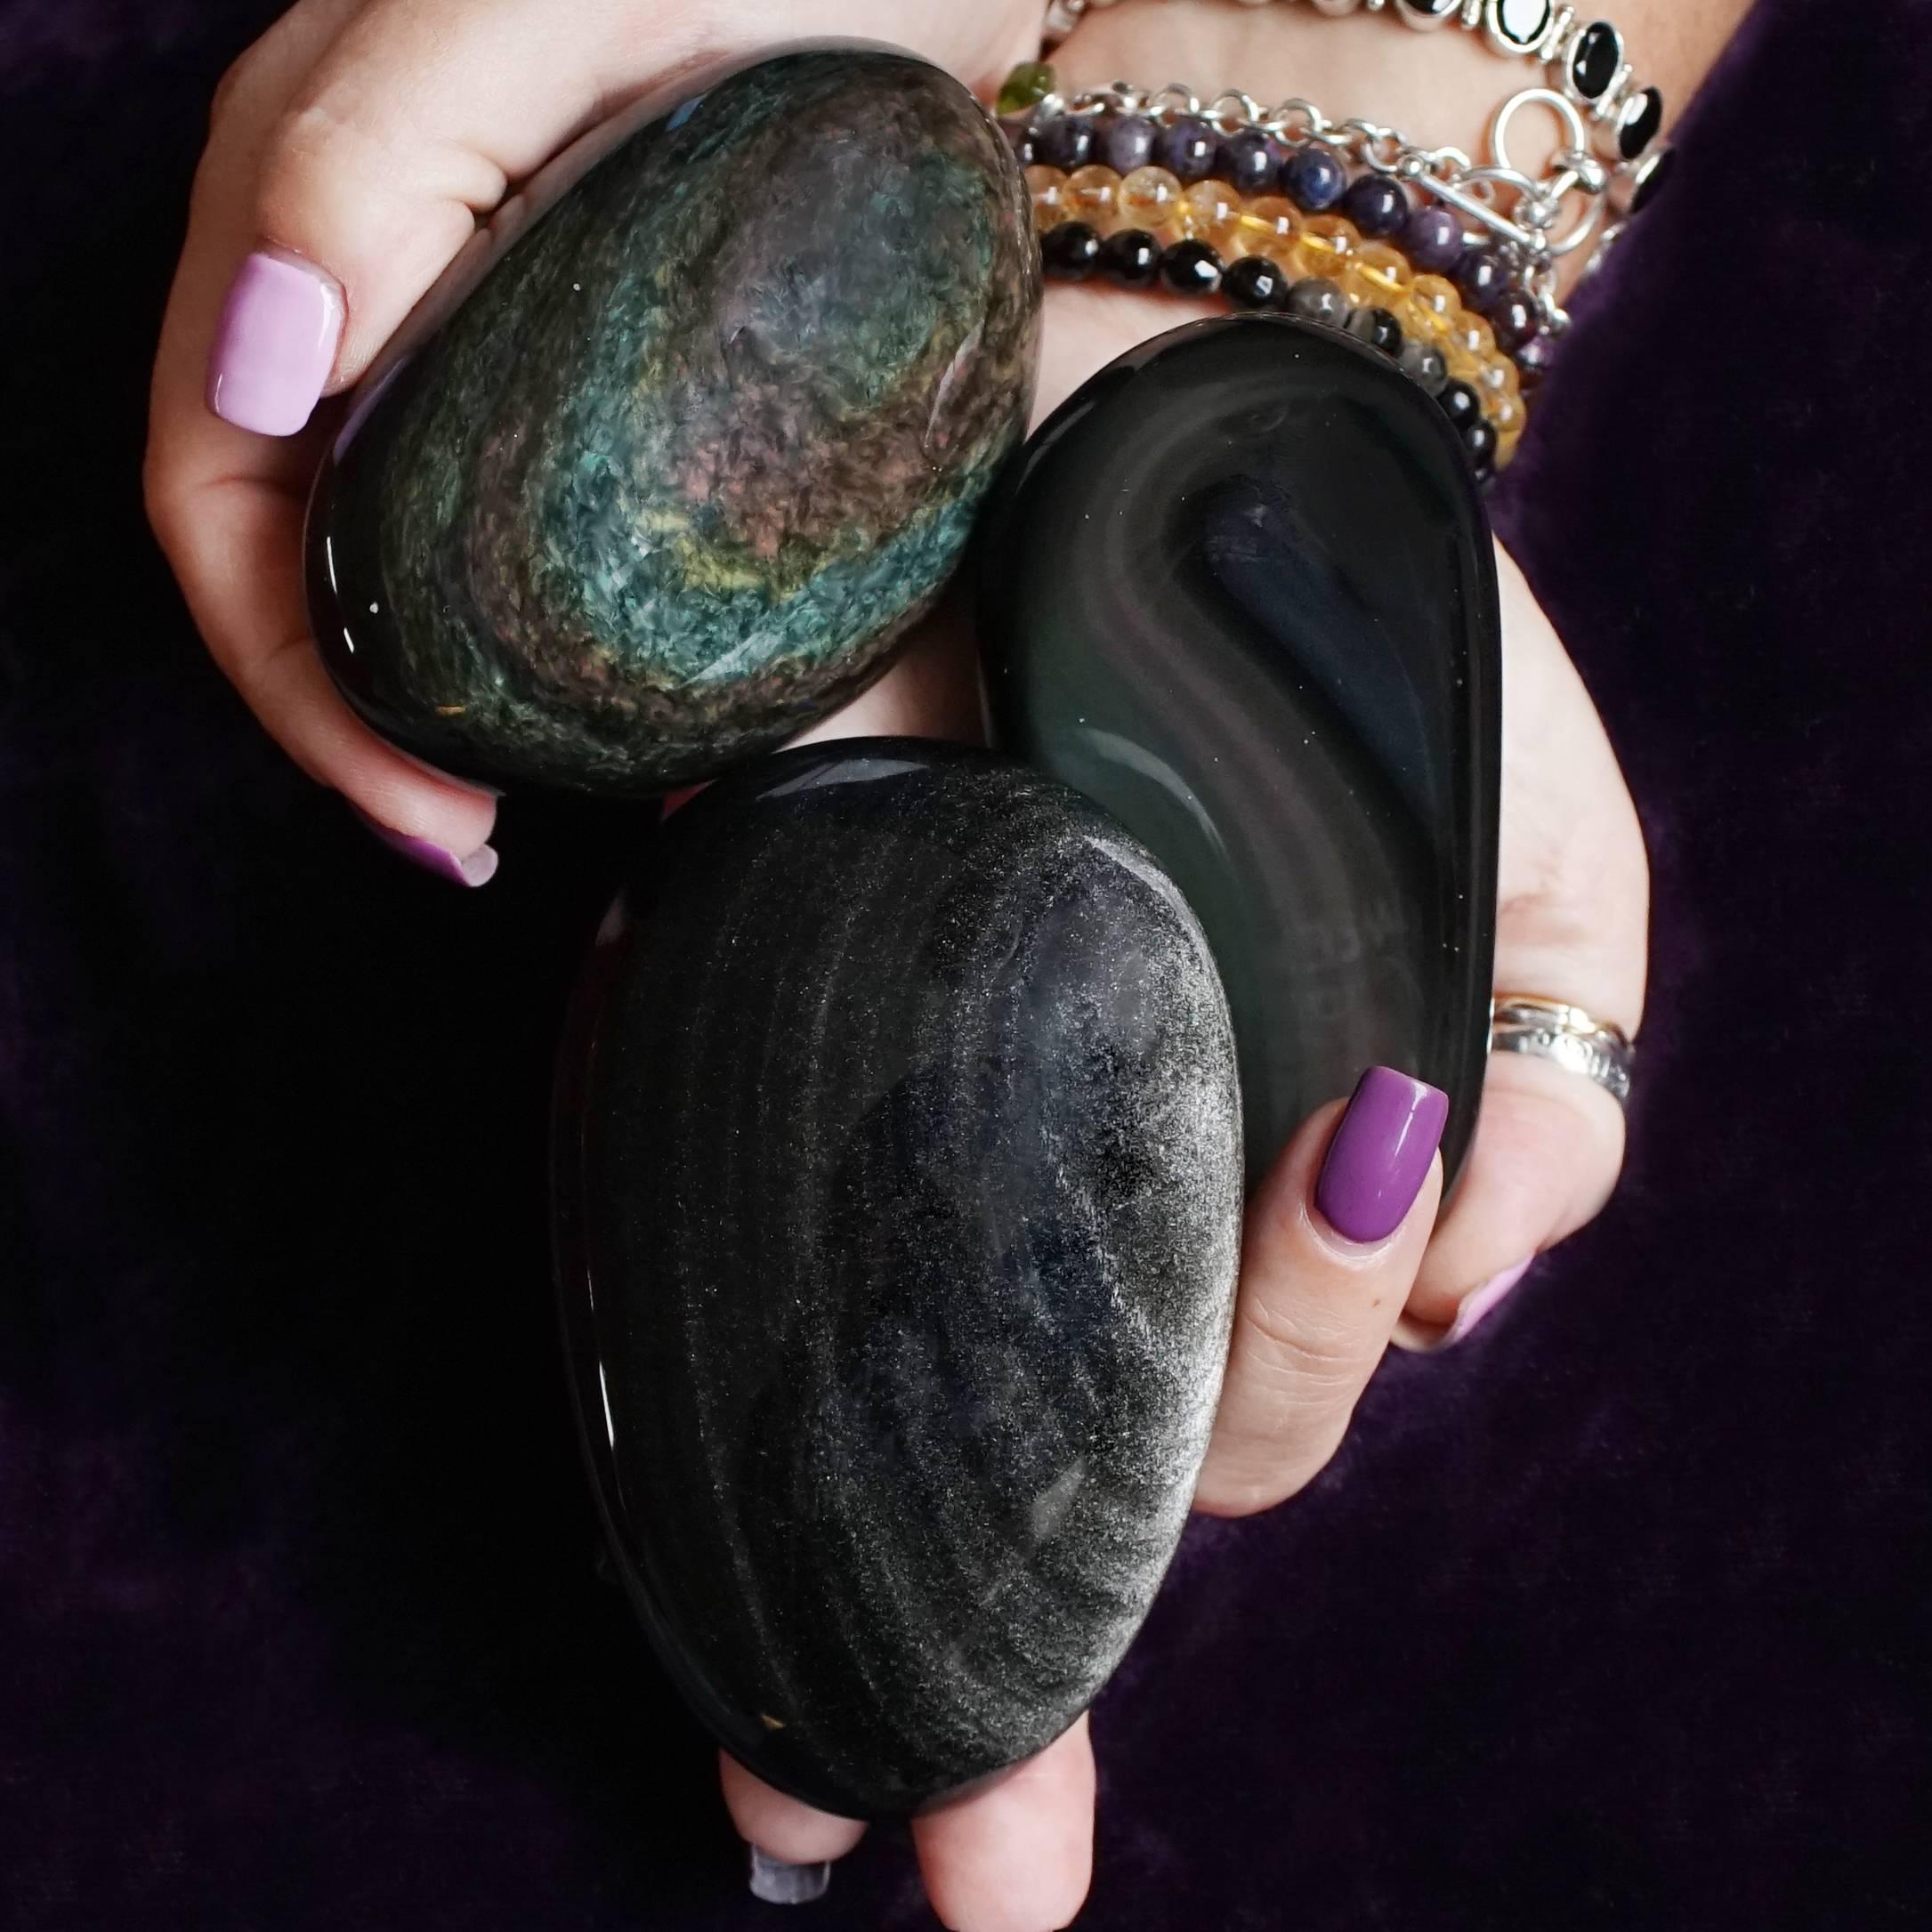 obsidian palm stones